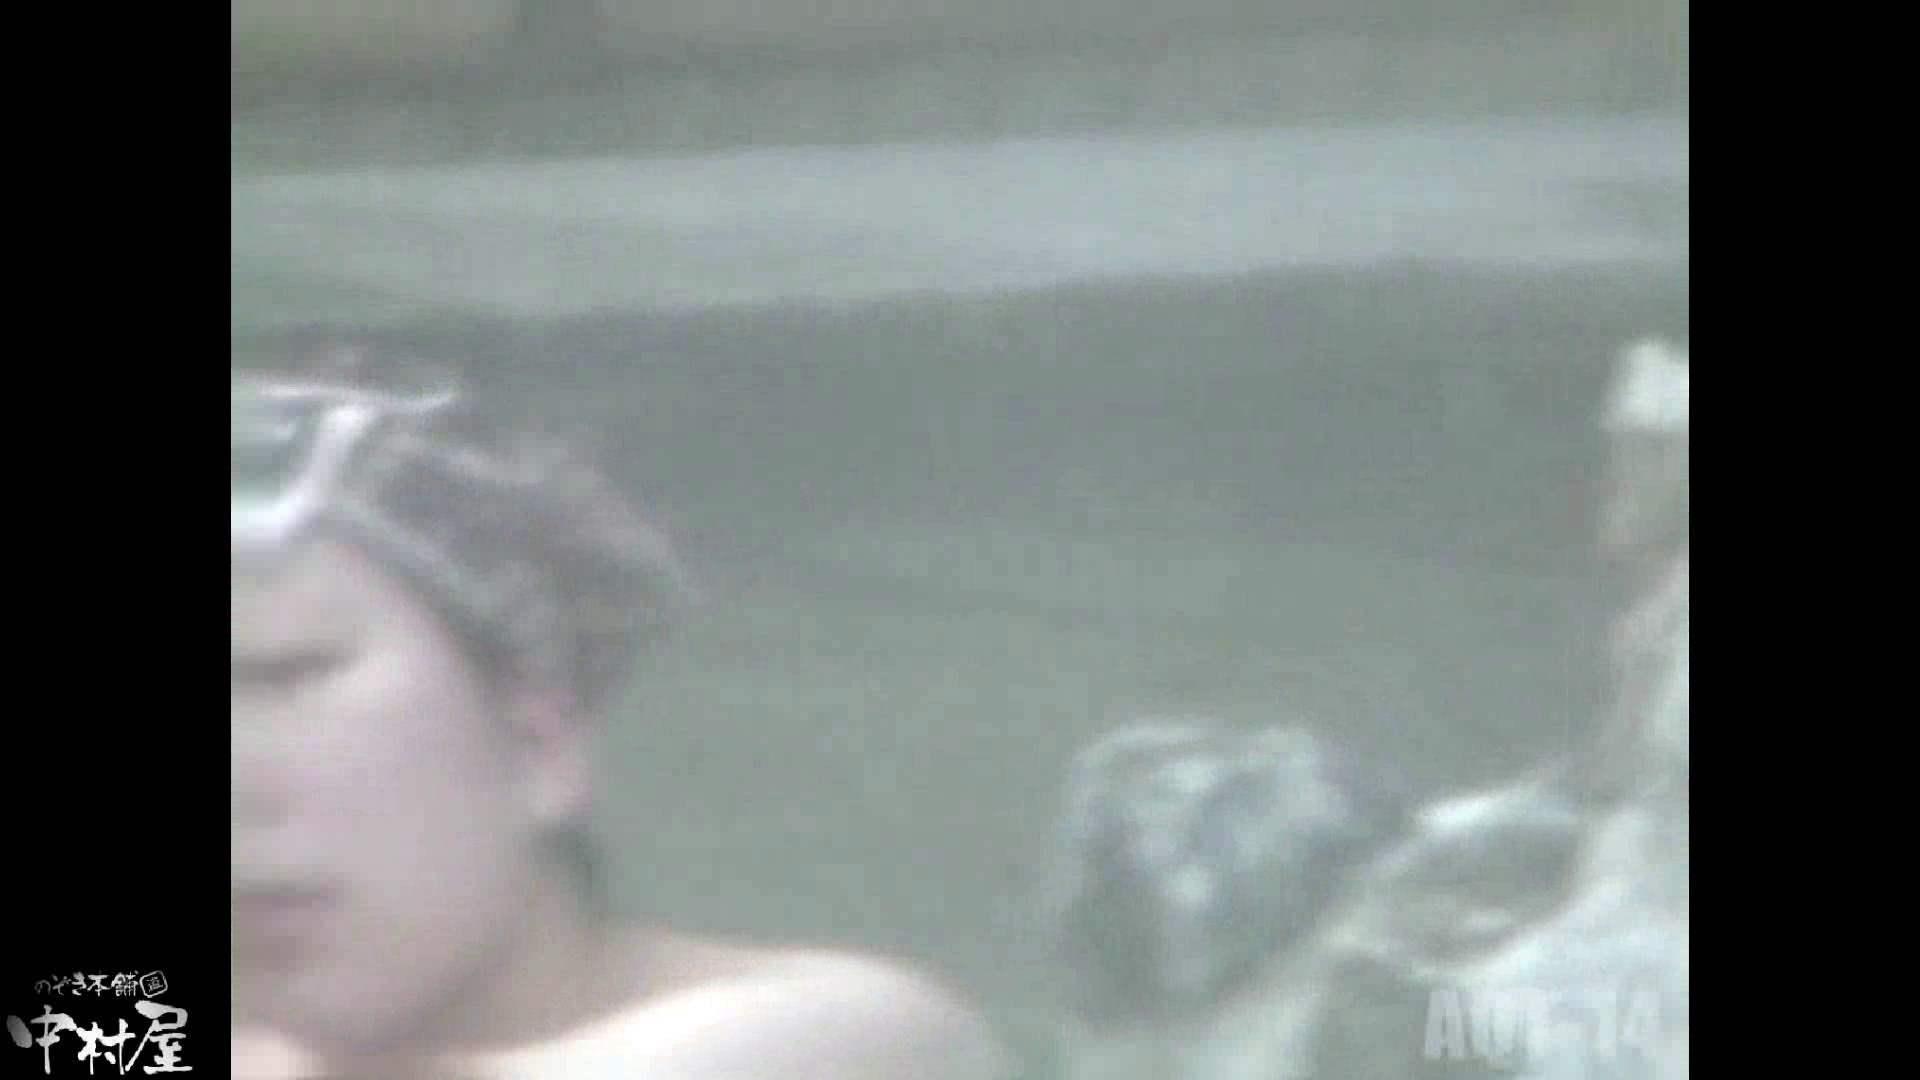 Aquaな露天風呂Vol.878潜入盗撮露天風呂十四判湯 其の十一 盗撮師作品 のぞき動画画像 94pic 54